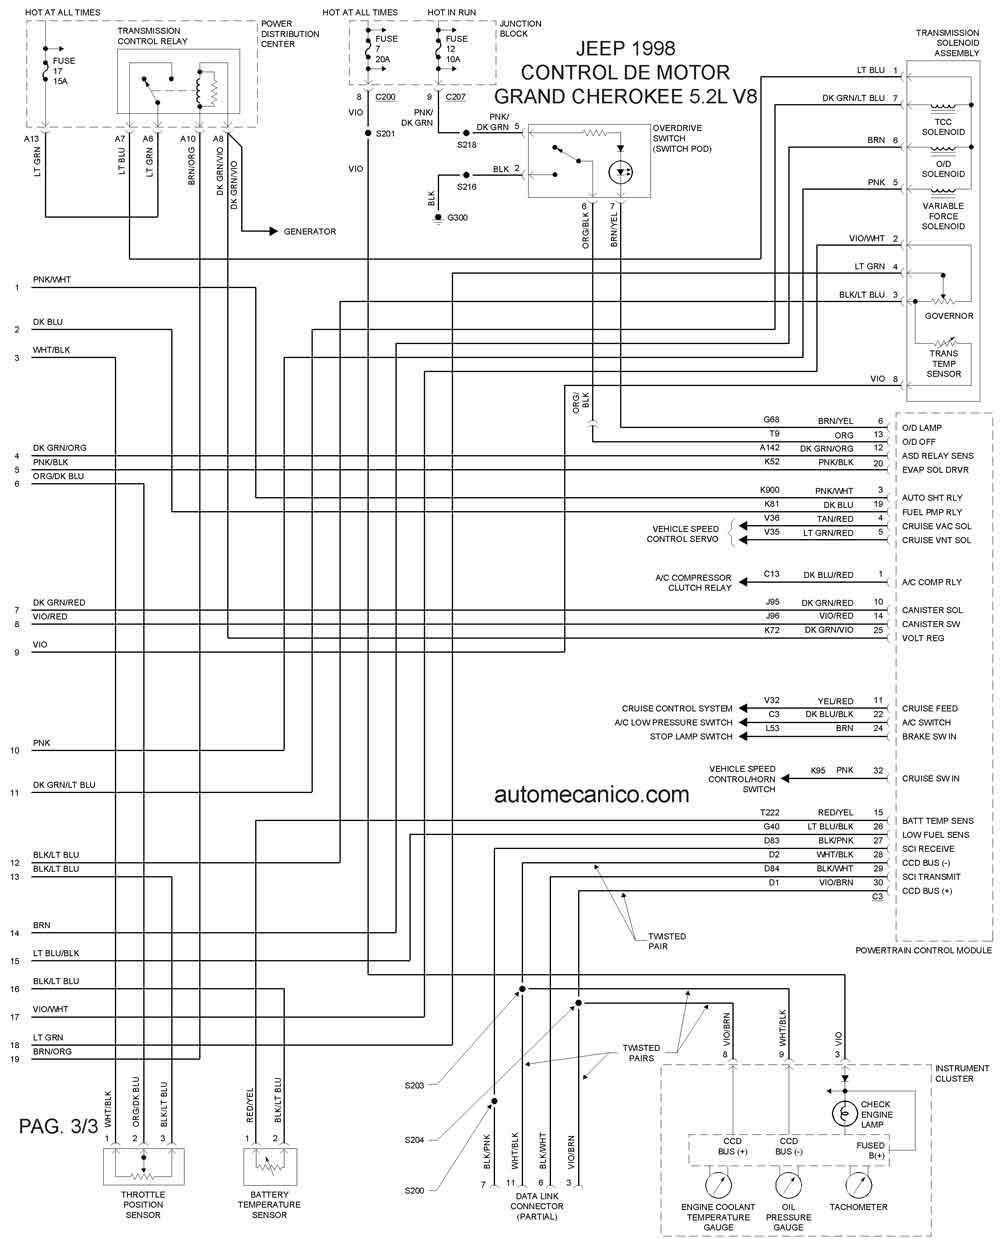 Grandcherokee on Diagrama De Transmision Automatica